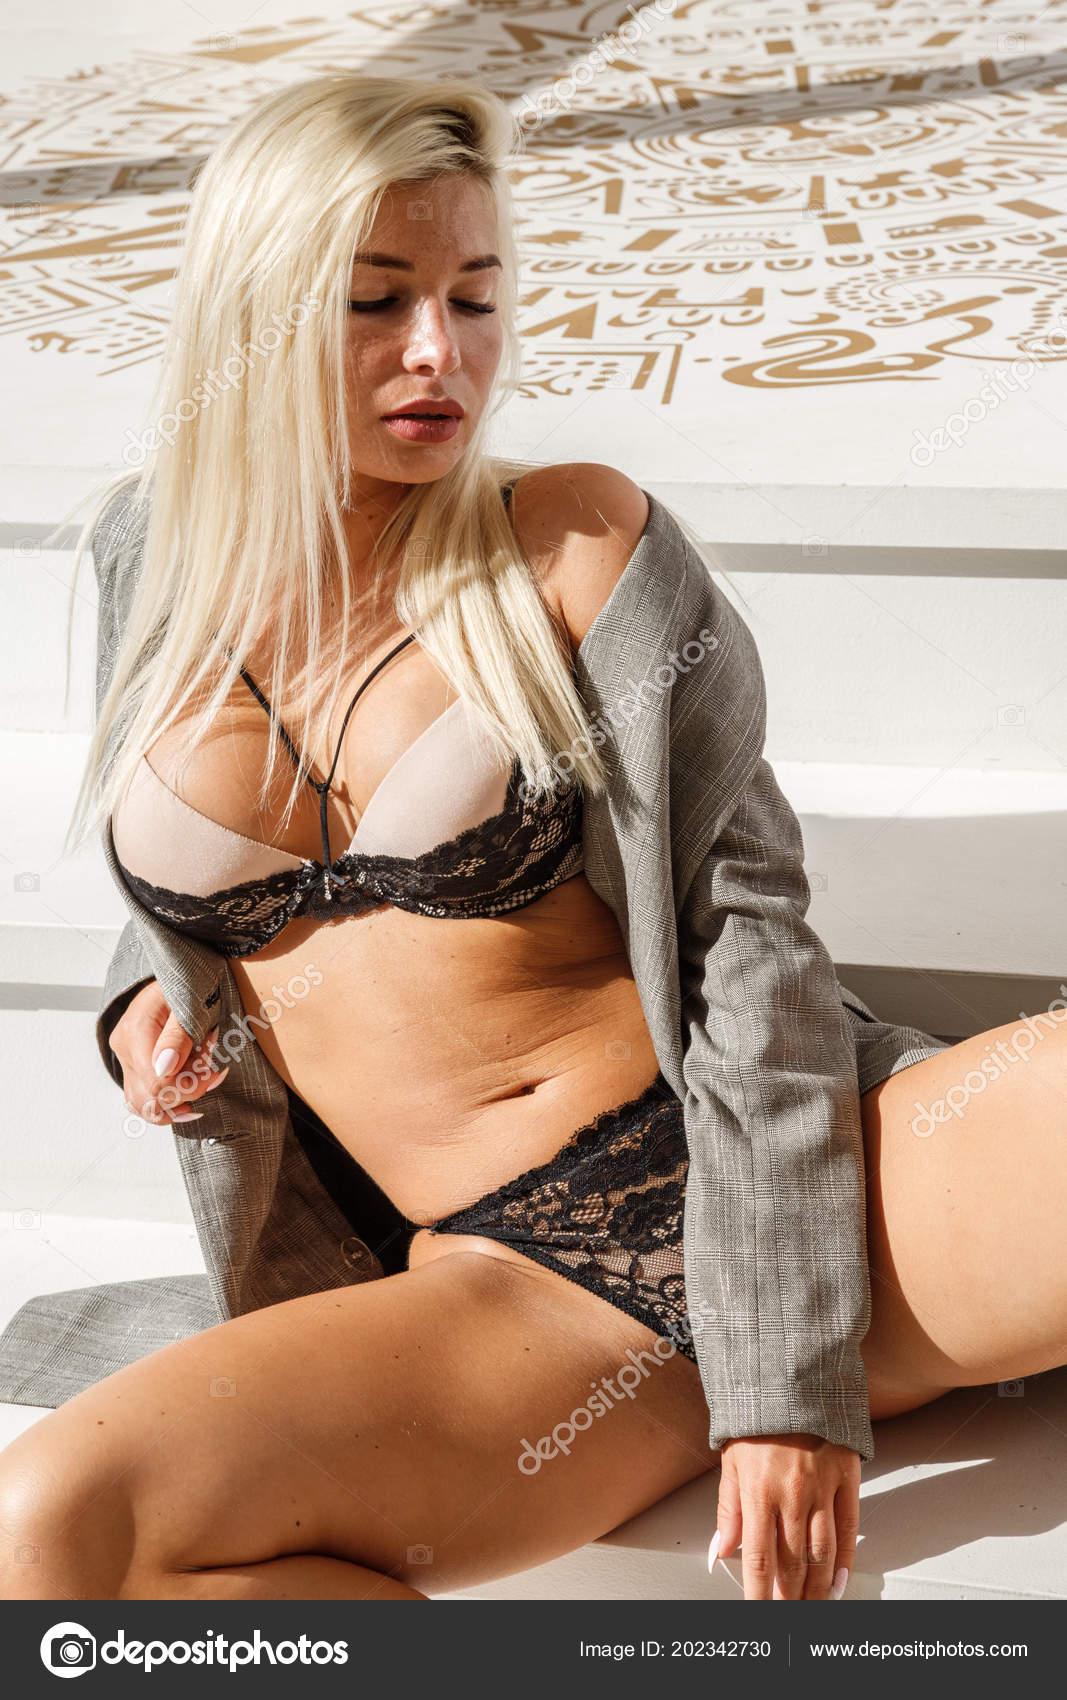 96bdf3342 Retrato da moda da mulher de beleza loira vestindo casaco cinzento e  lingerie sexual